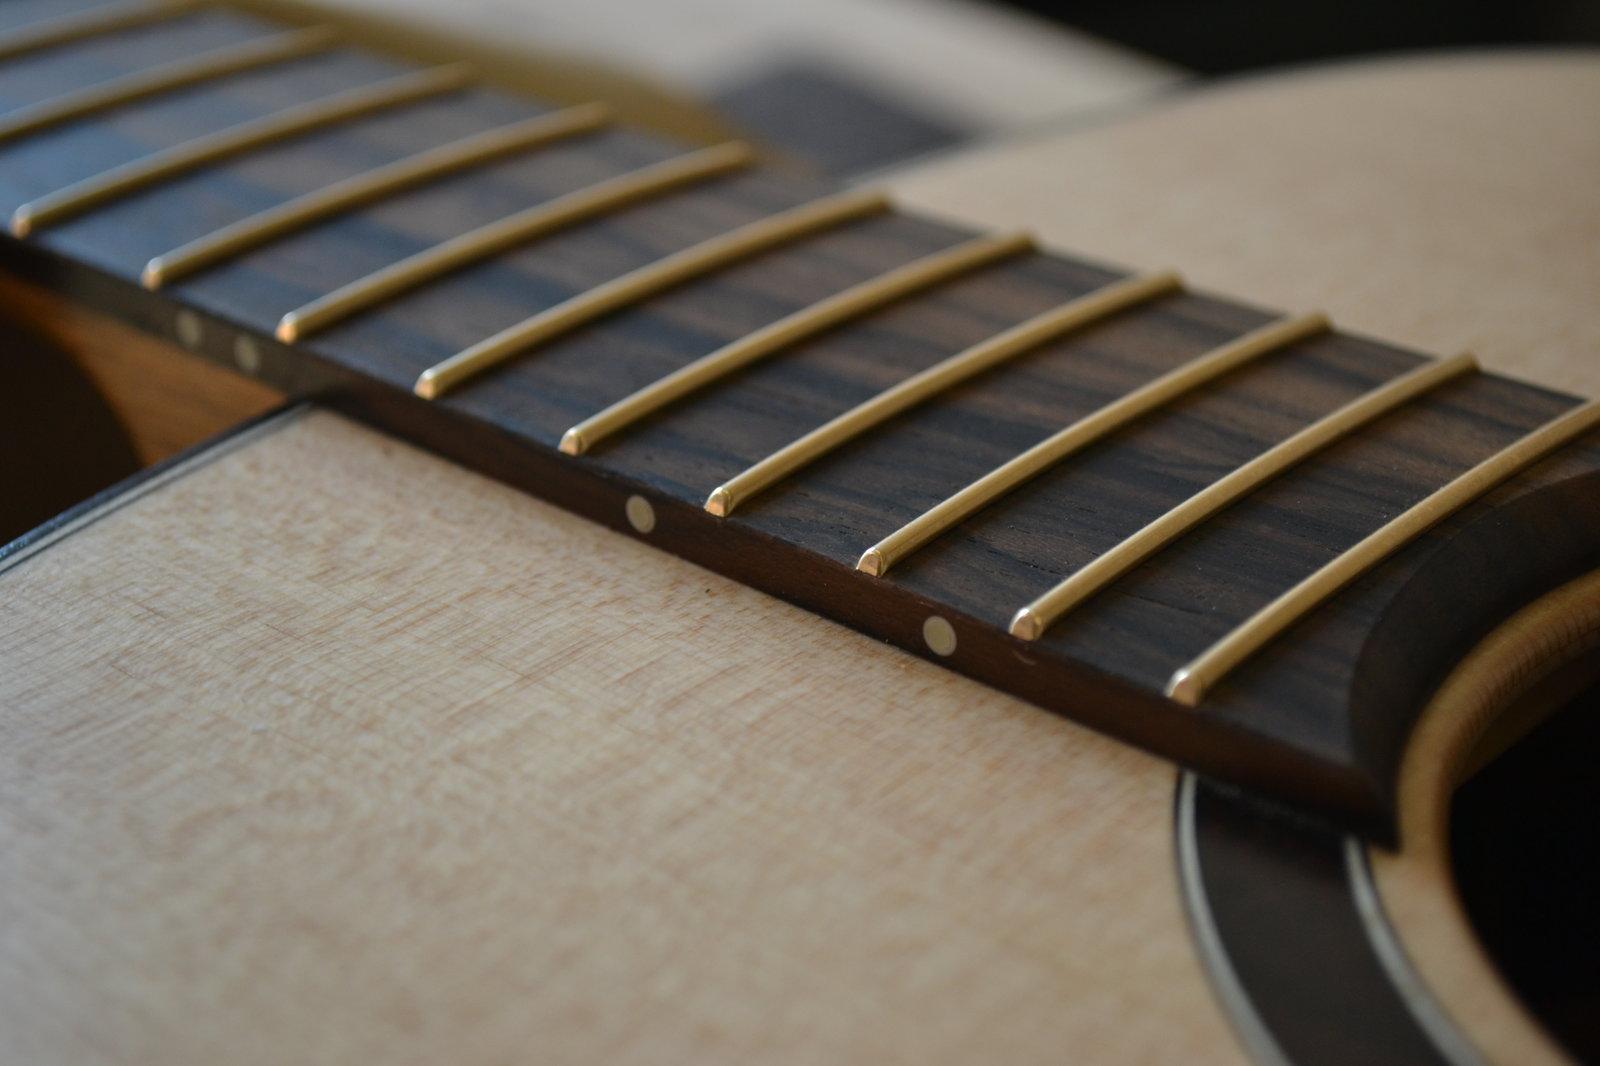 Guitare Baron 12 cordes (fabrication en cours) - Page 2 191212024215858053